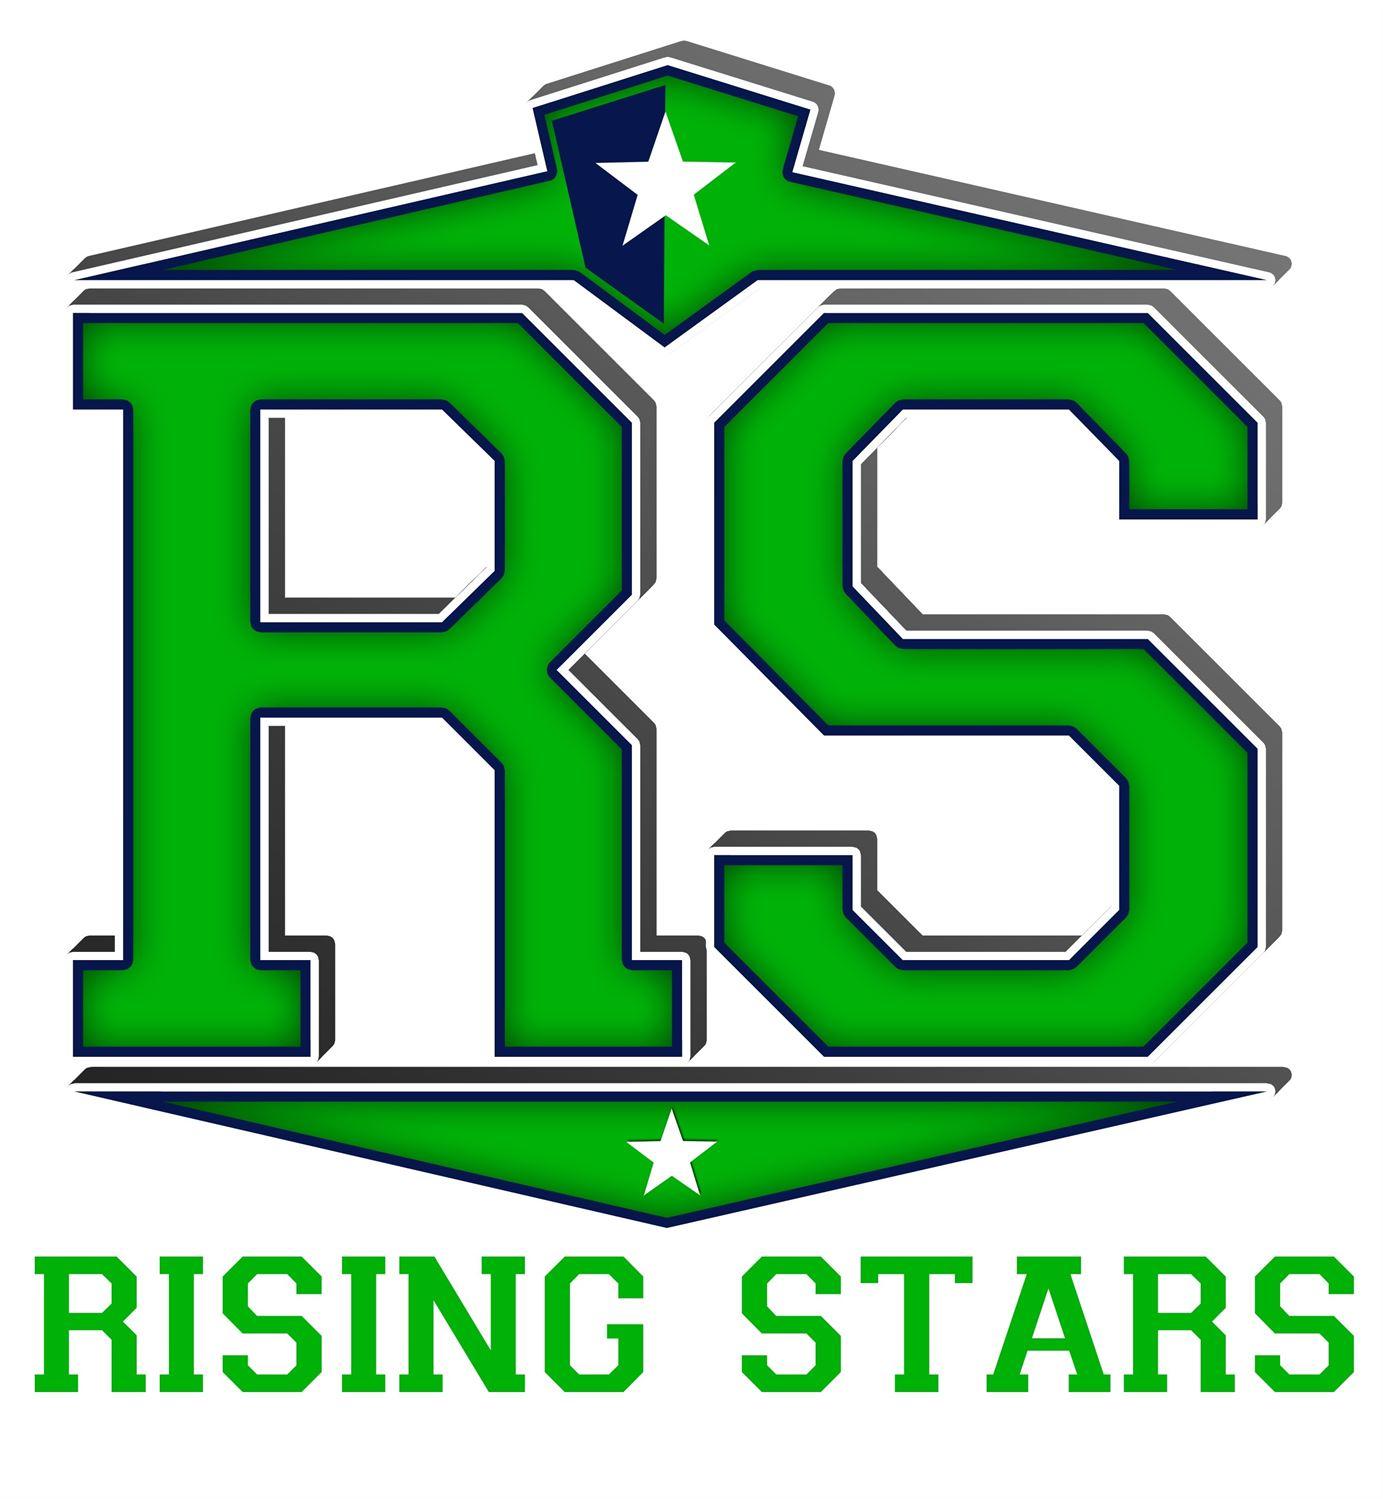 Rising Stars - Rising Stars